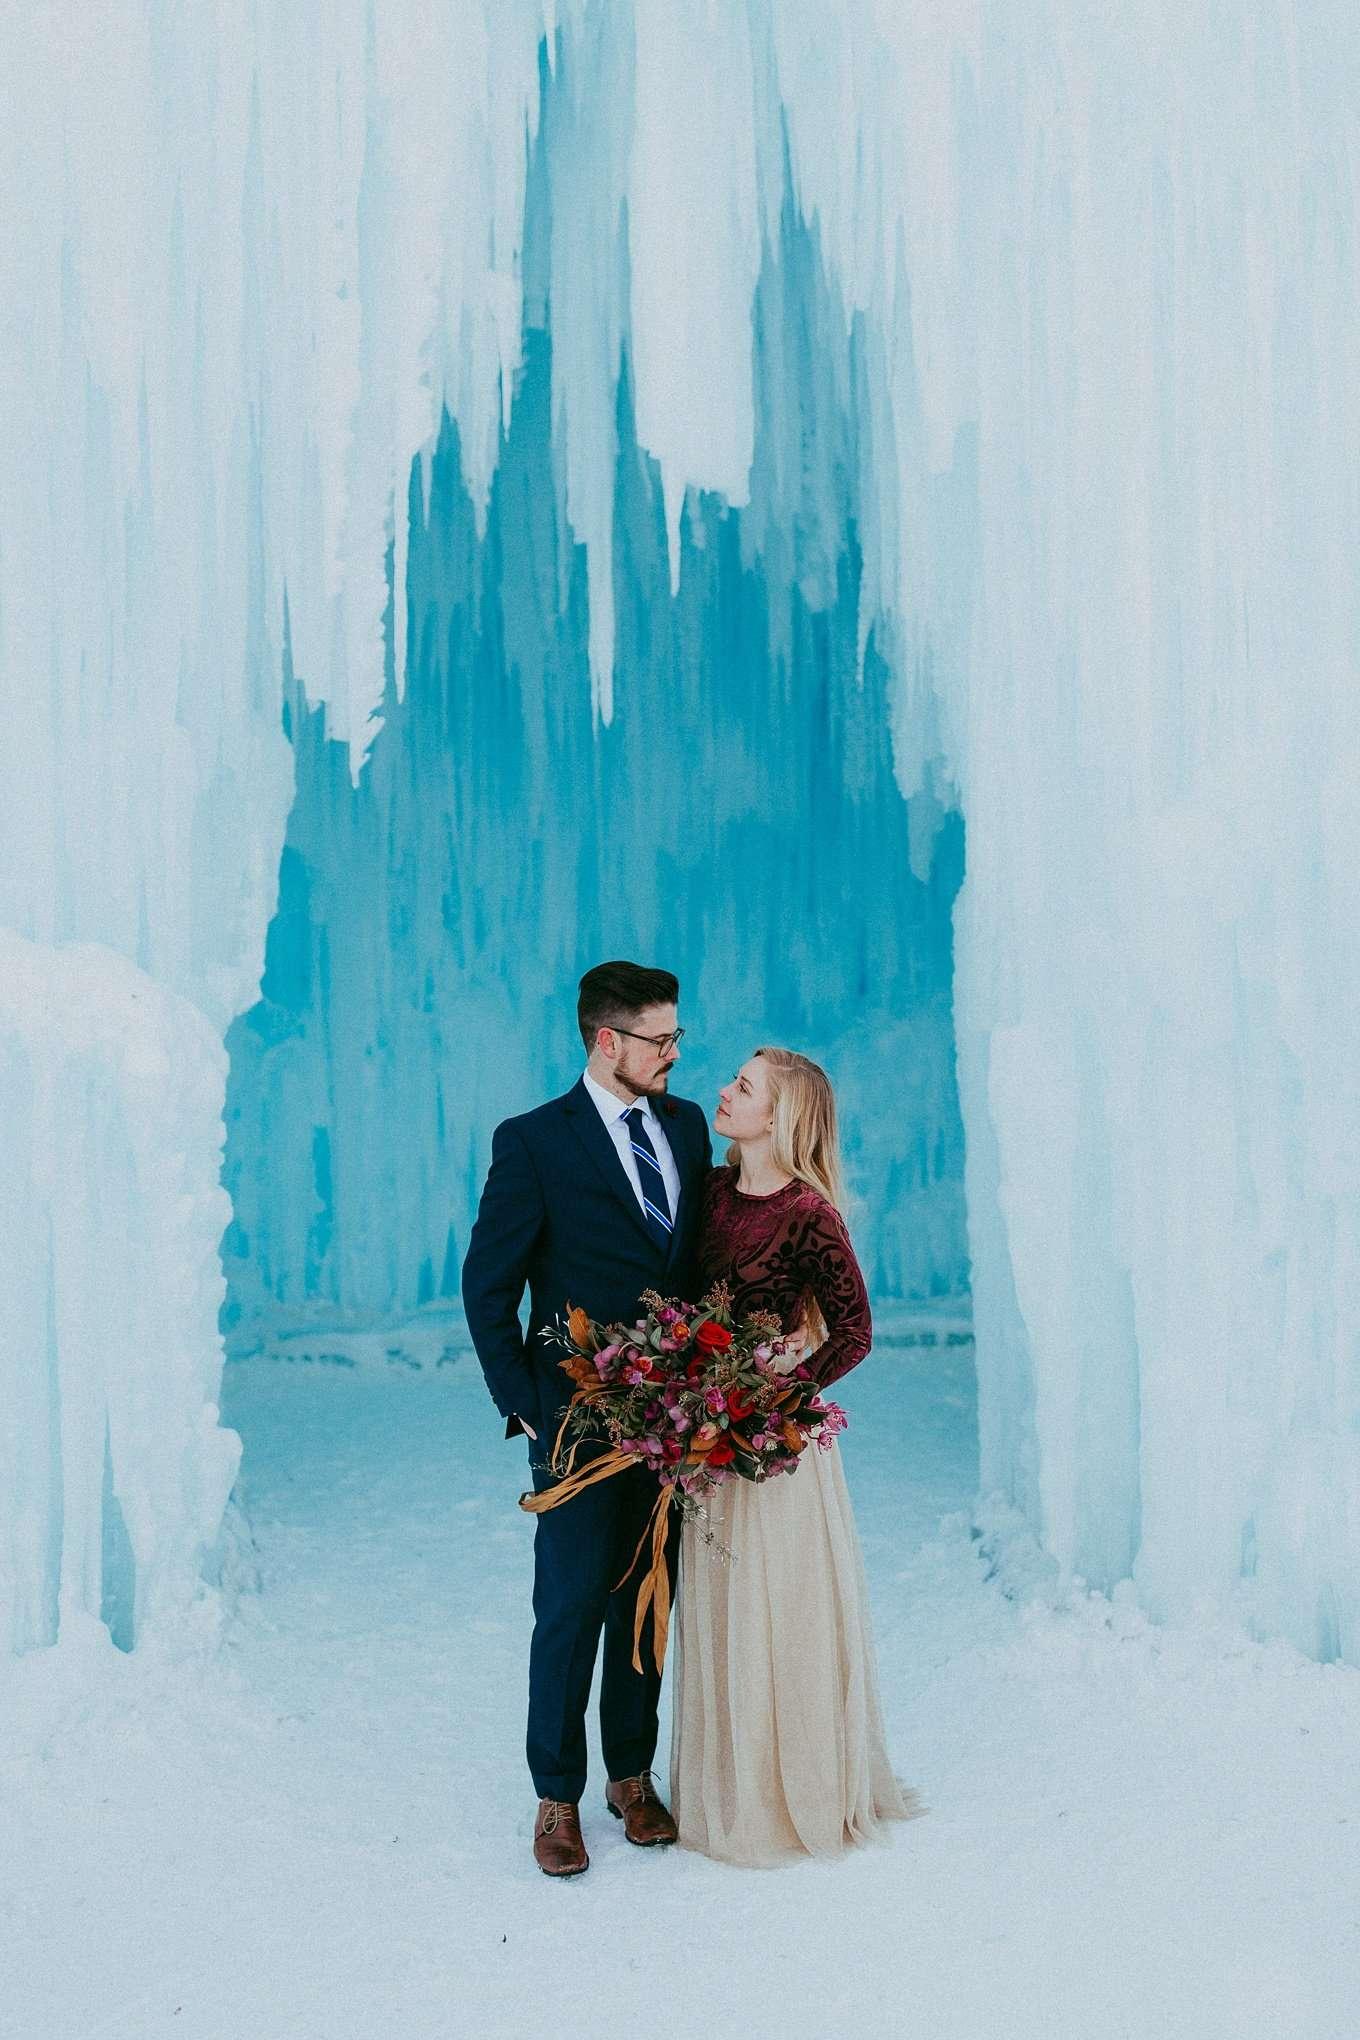 yeg photographer, edmonton photographers, edmonton photographer, ice castle engagement, edmonton wedding photographers, edmonton wedding photographer